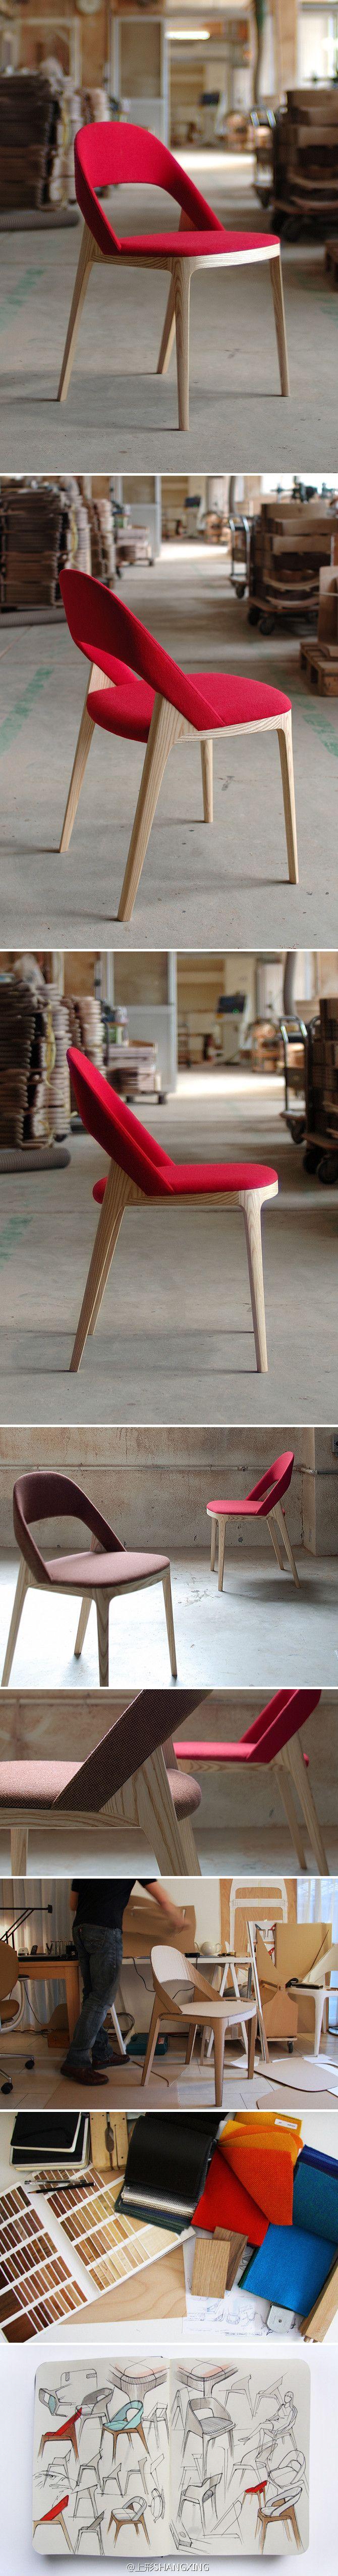 Clamp Chair | http://www.andreaskowalewski.com/ source ideasforbeautypic.com